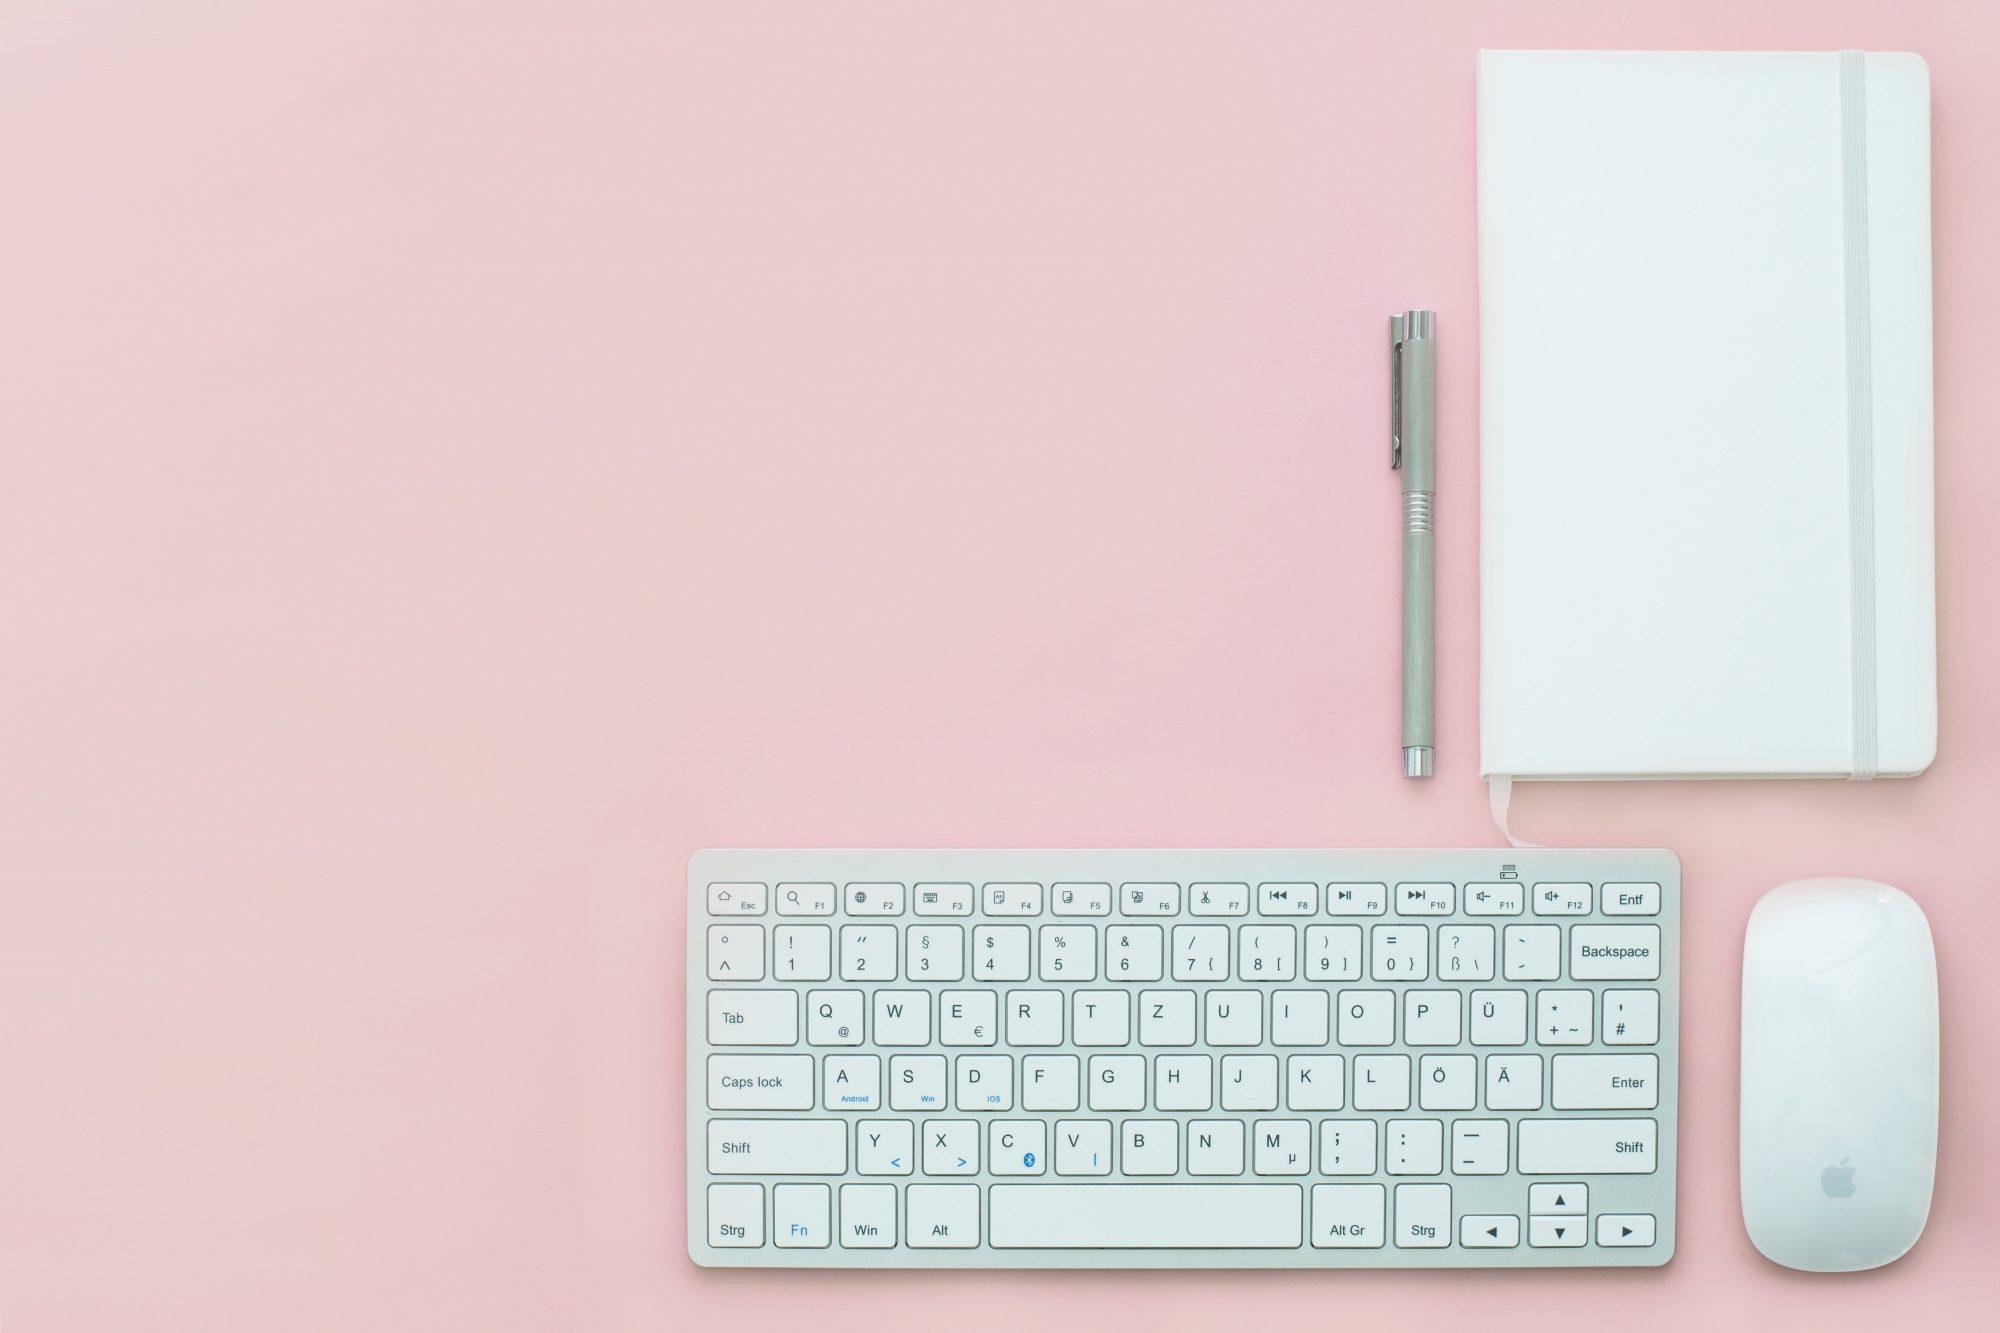 prilohac2_apple-background-desk-electronics-399161